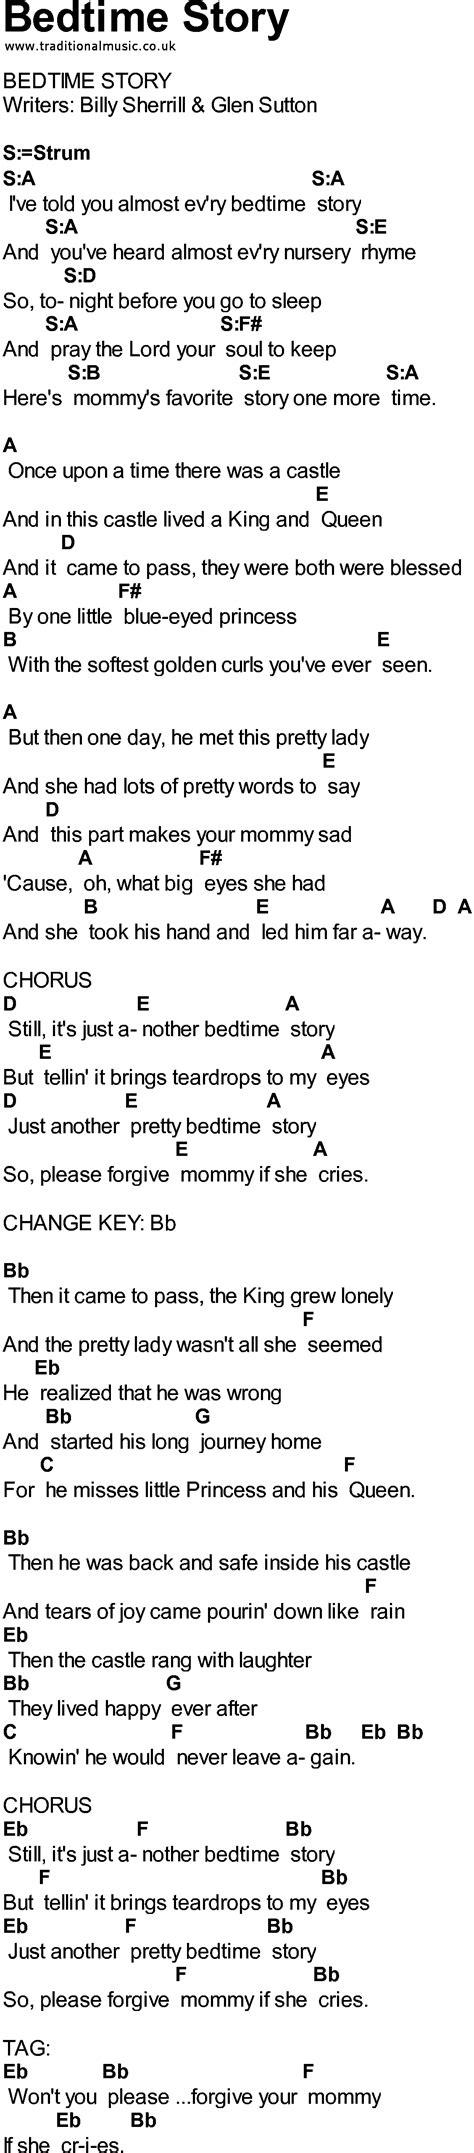 bed time music bedtime story lyrics